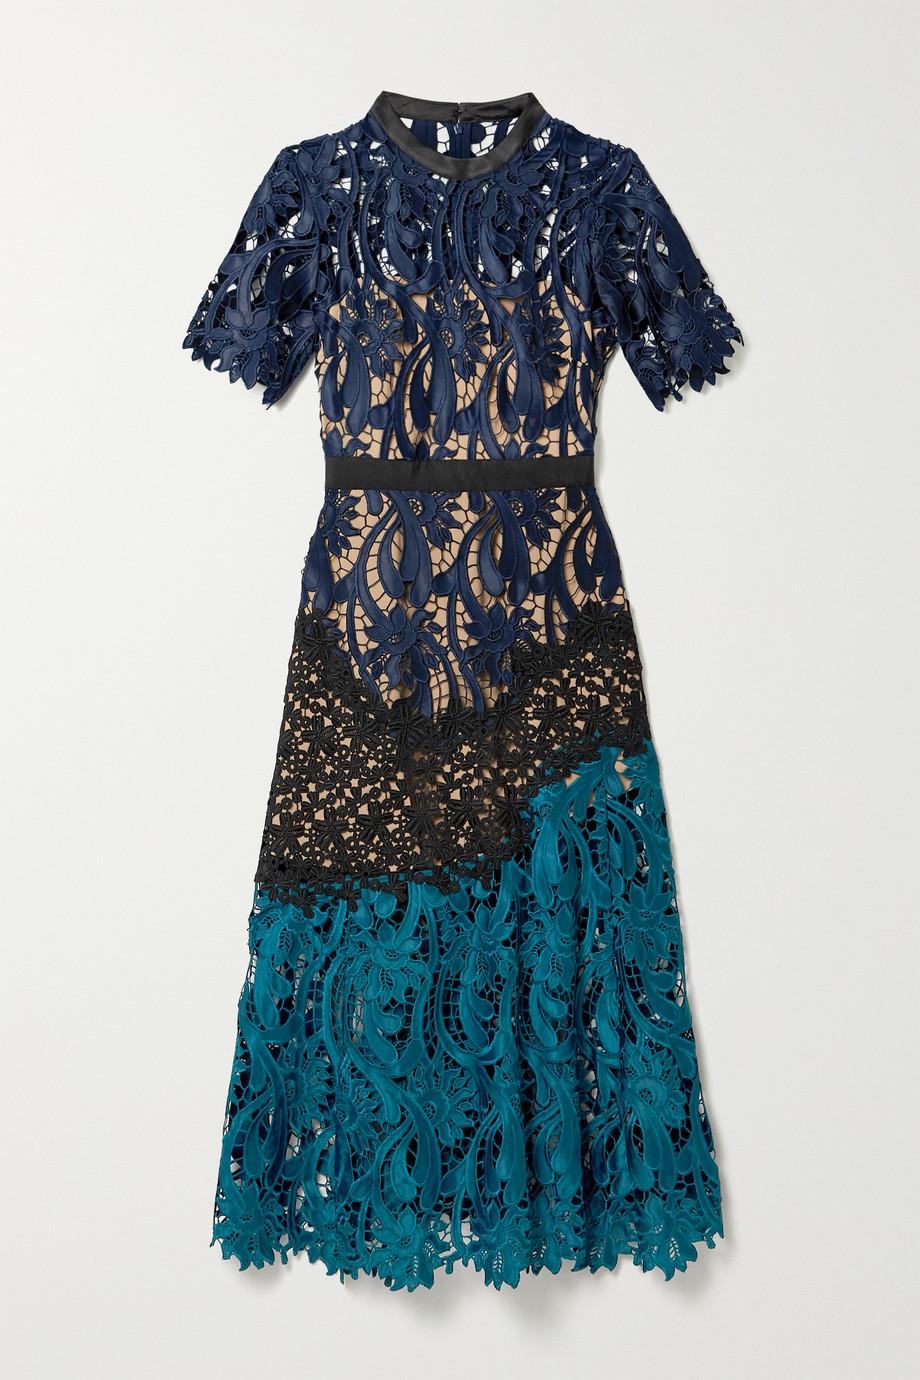 Self-Portrait Satin and grosgrain-trimmed paneled guipure lace midi dress